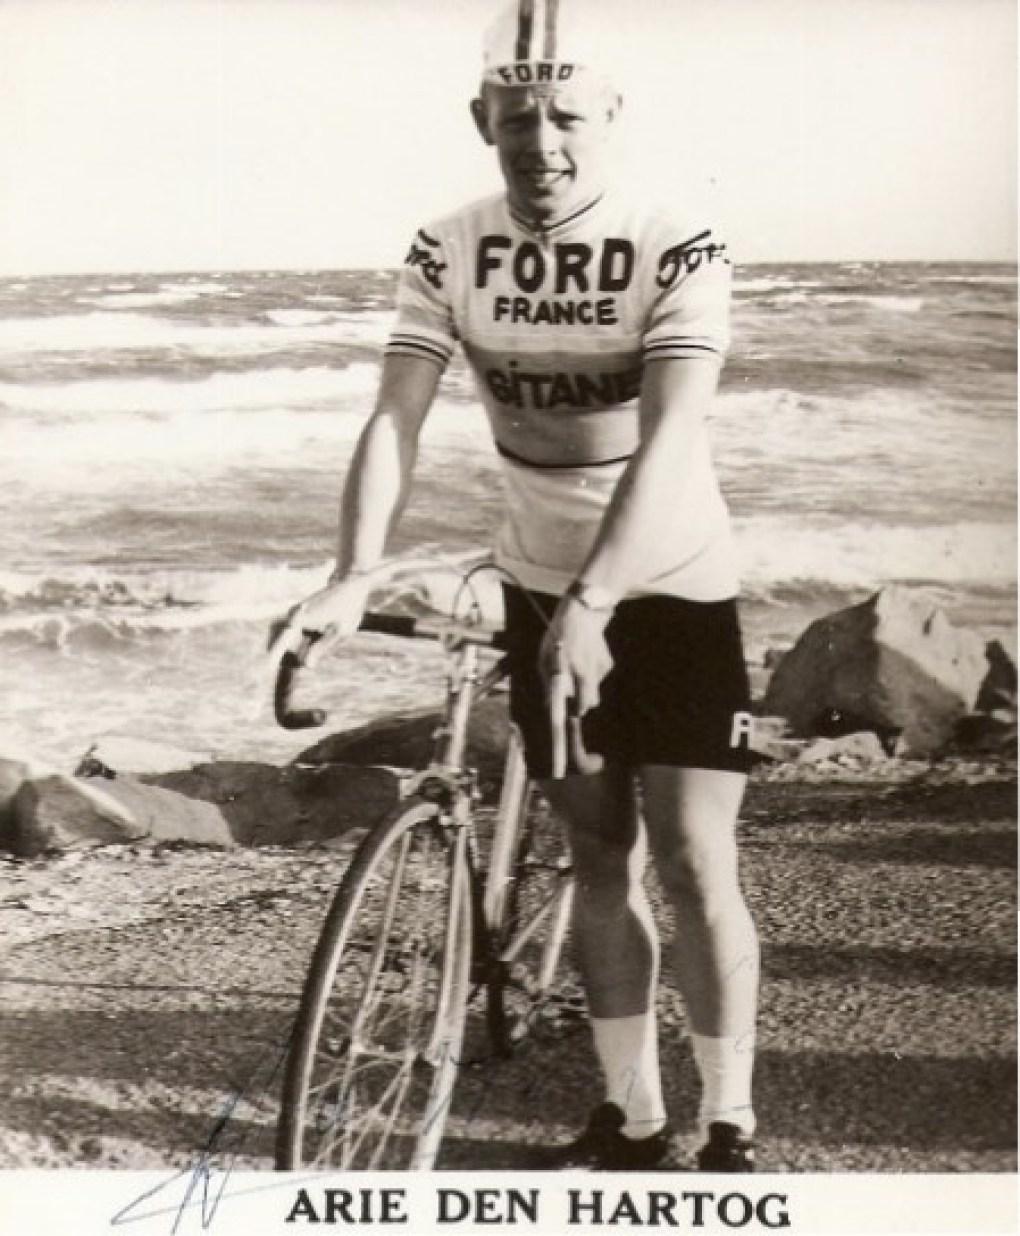 1966-arie-den-hartog-equipe-ford-france-hutchinson